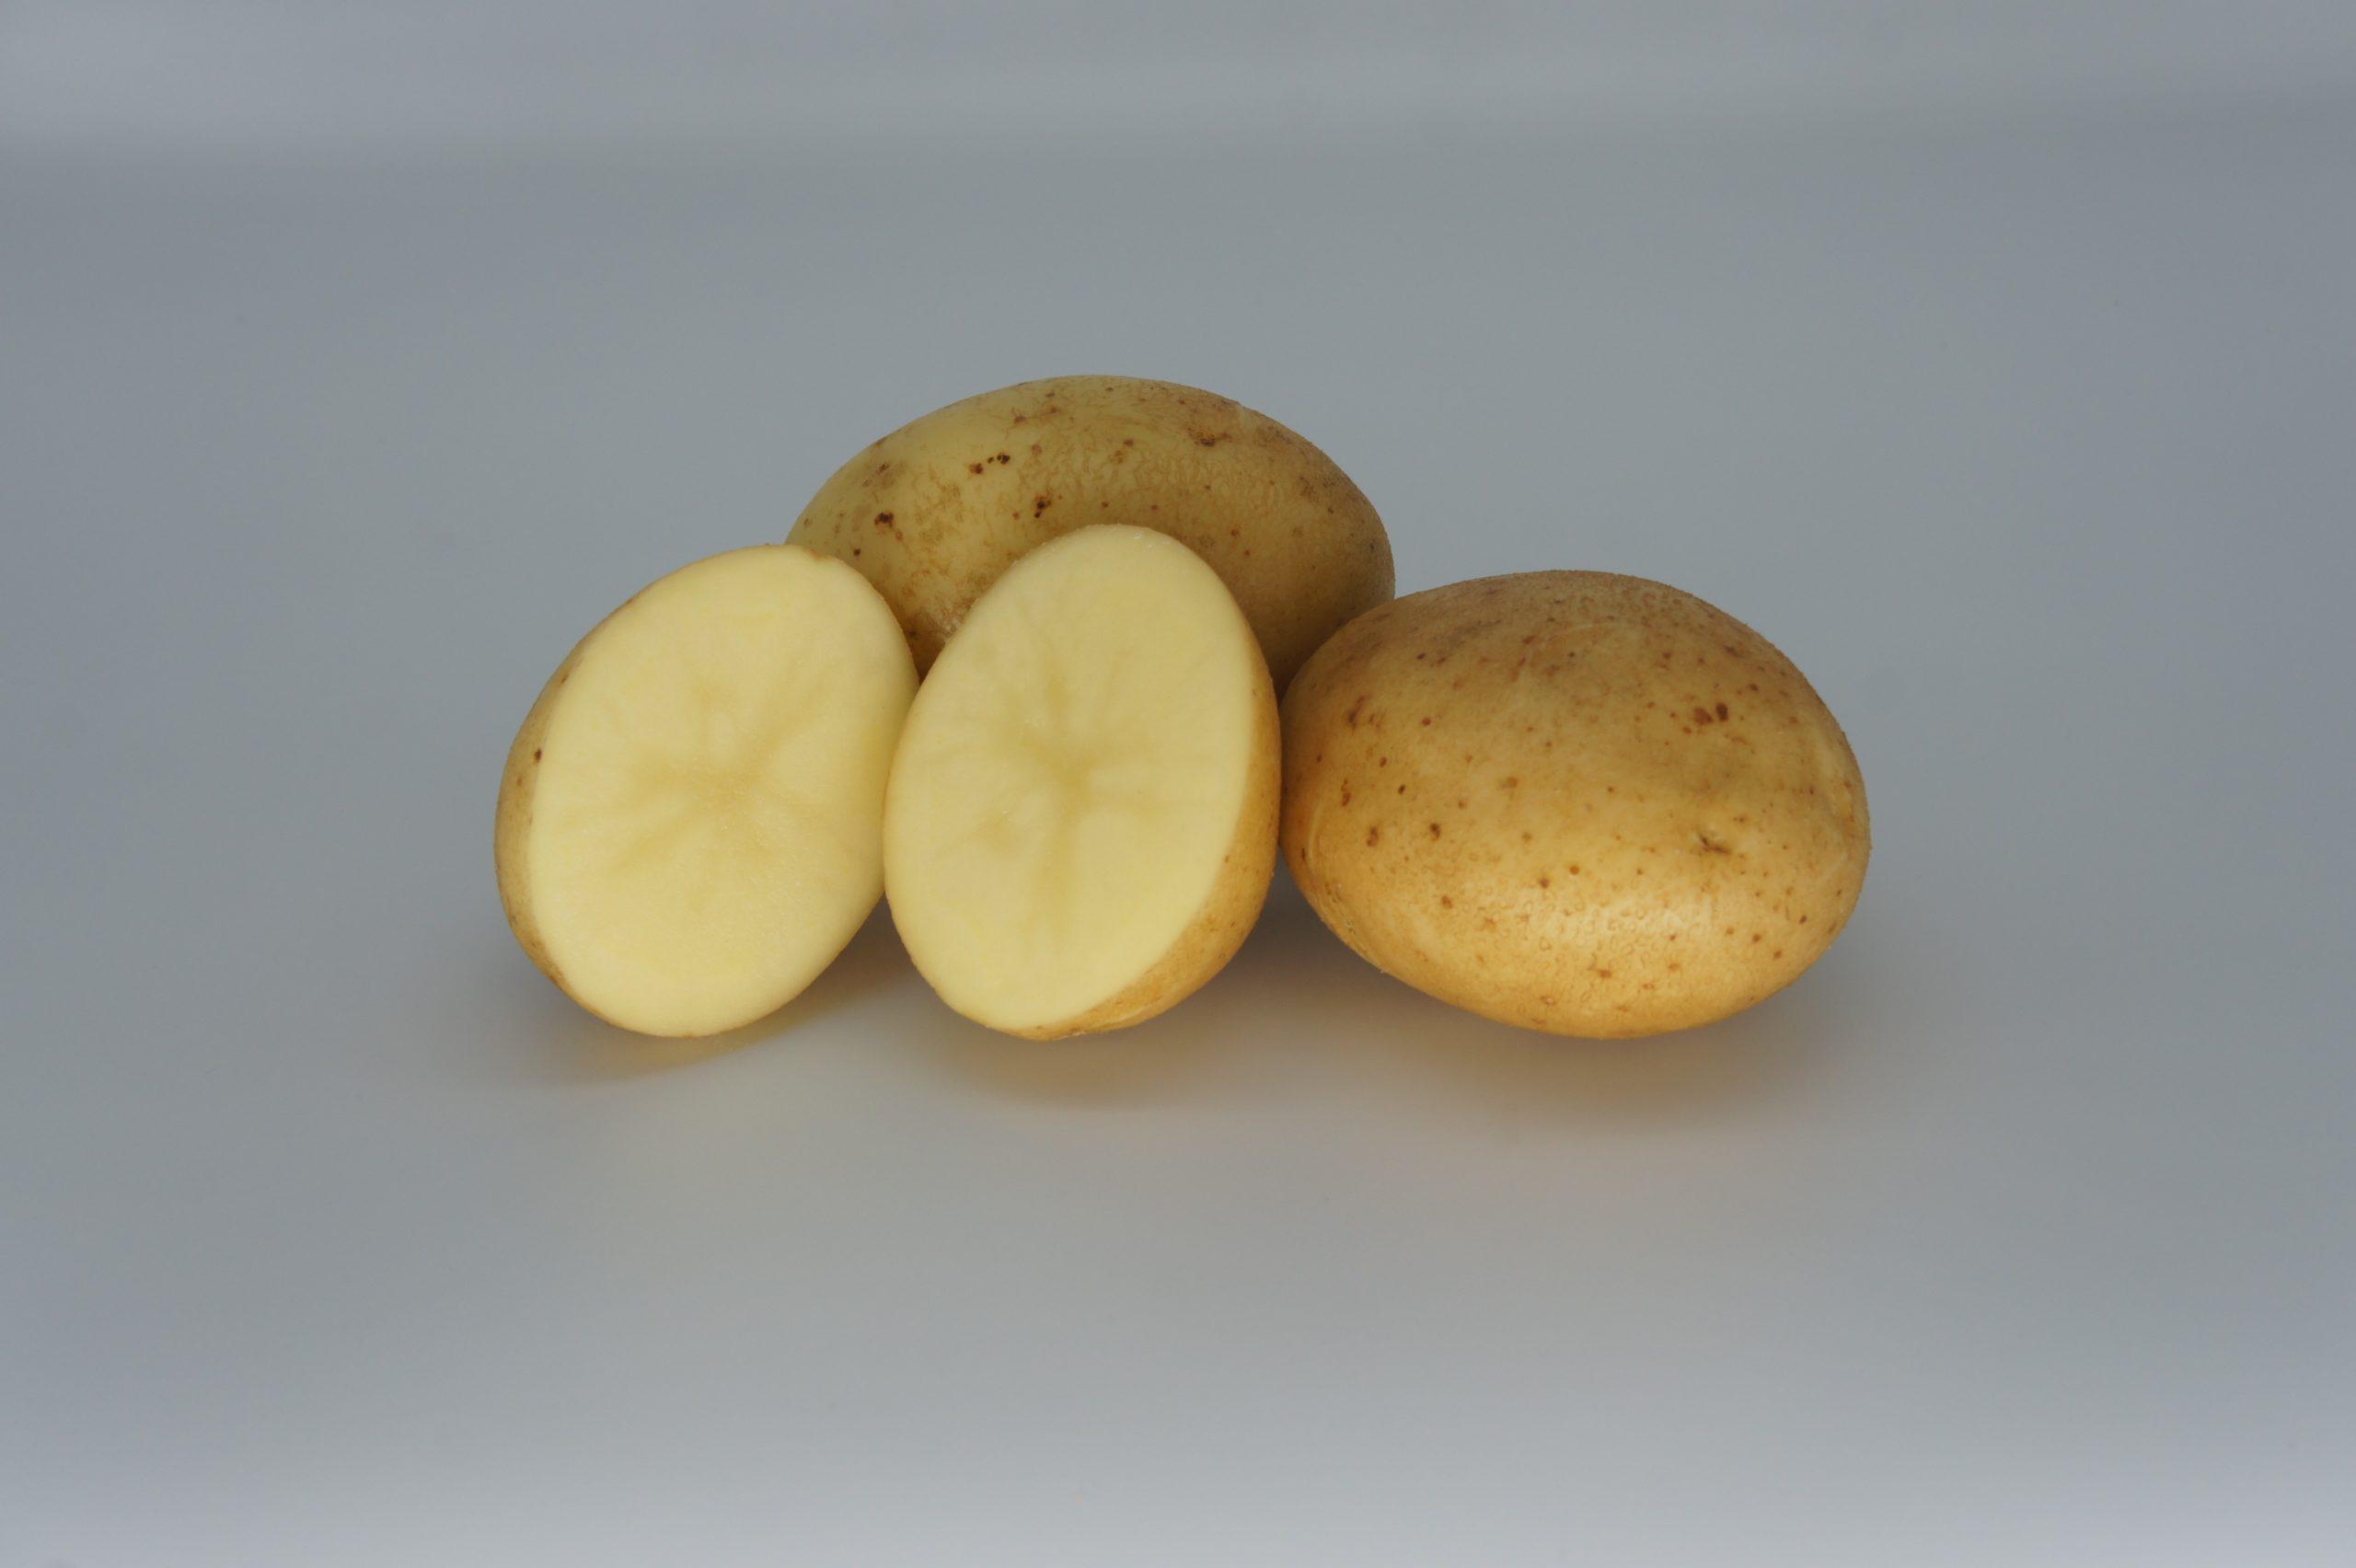 Estima Bakers 2020 The Potato Shop